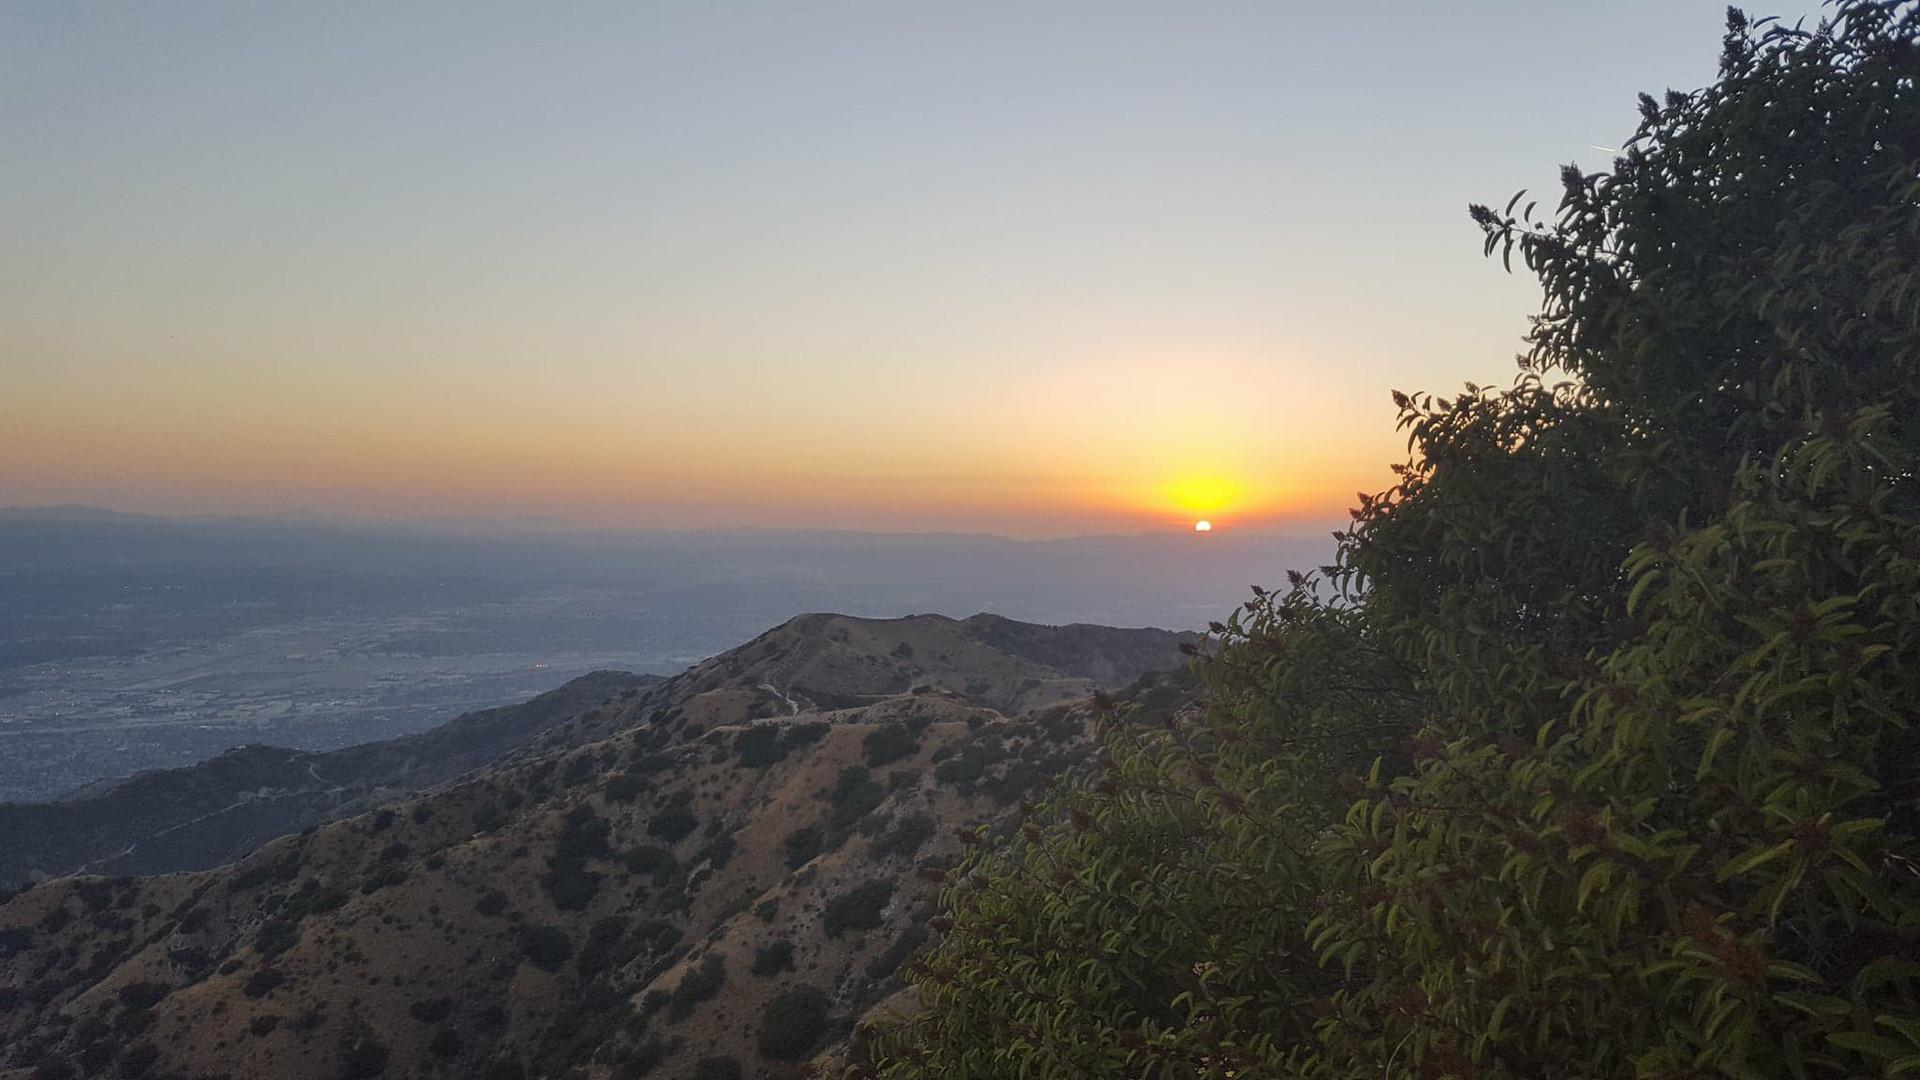 destination run wildwood canyon trail california jamey srock 2